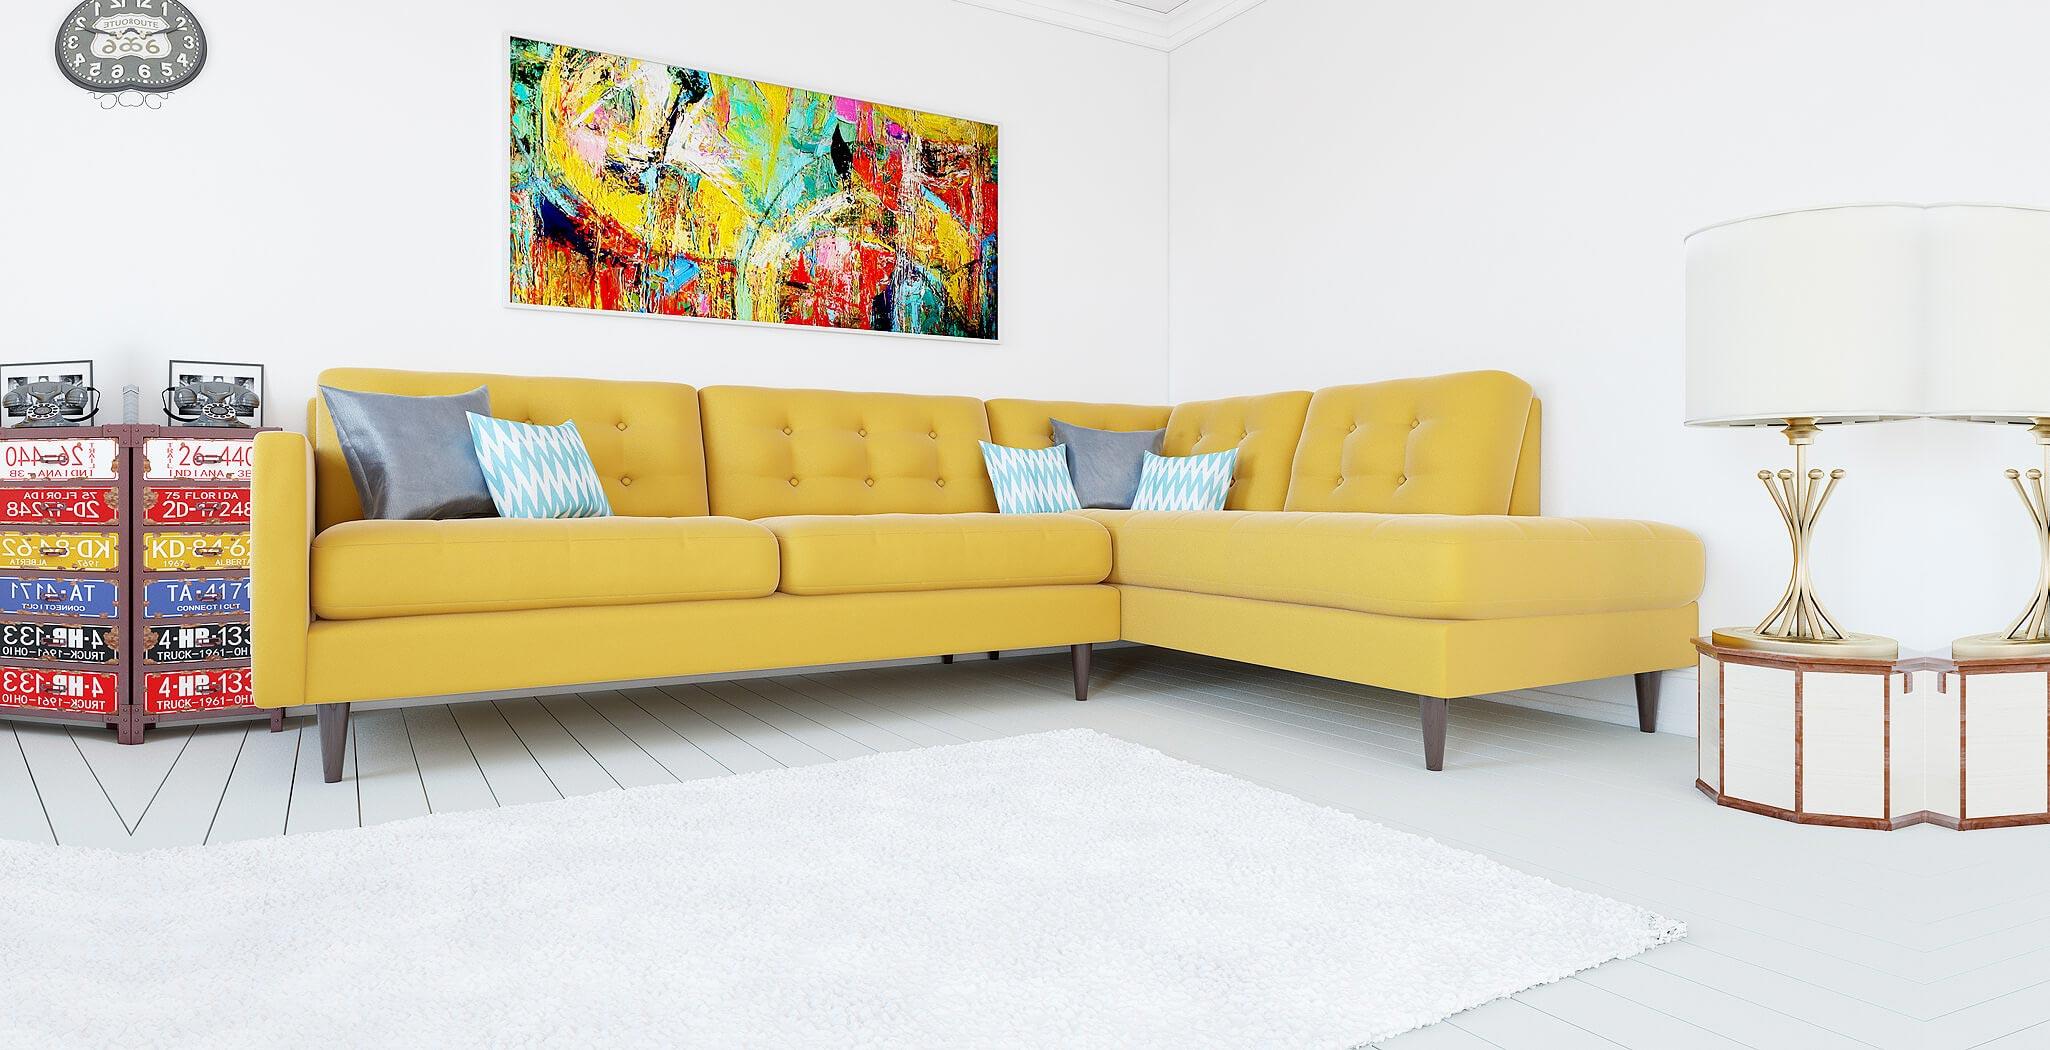 oslo panel furniture gallery 3